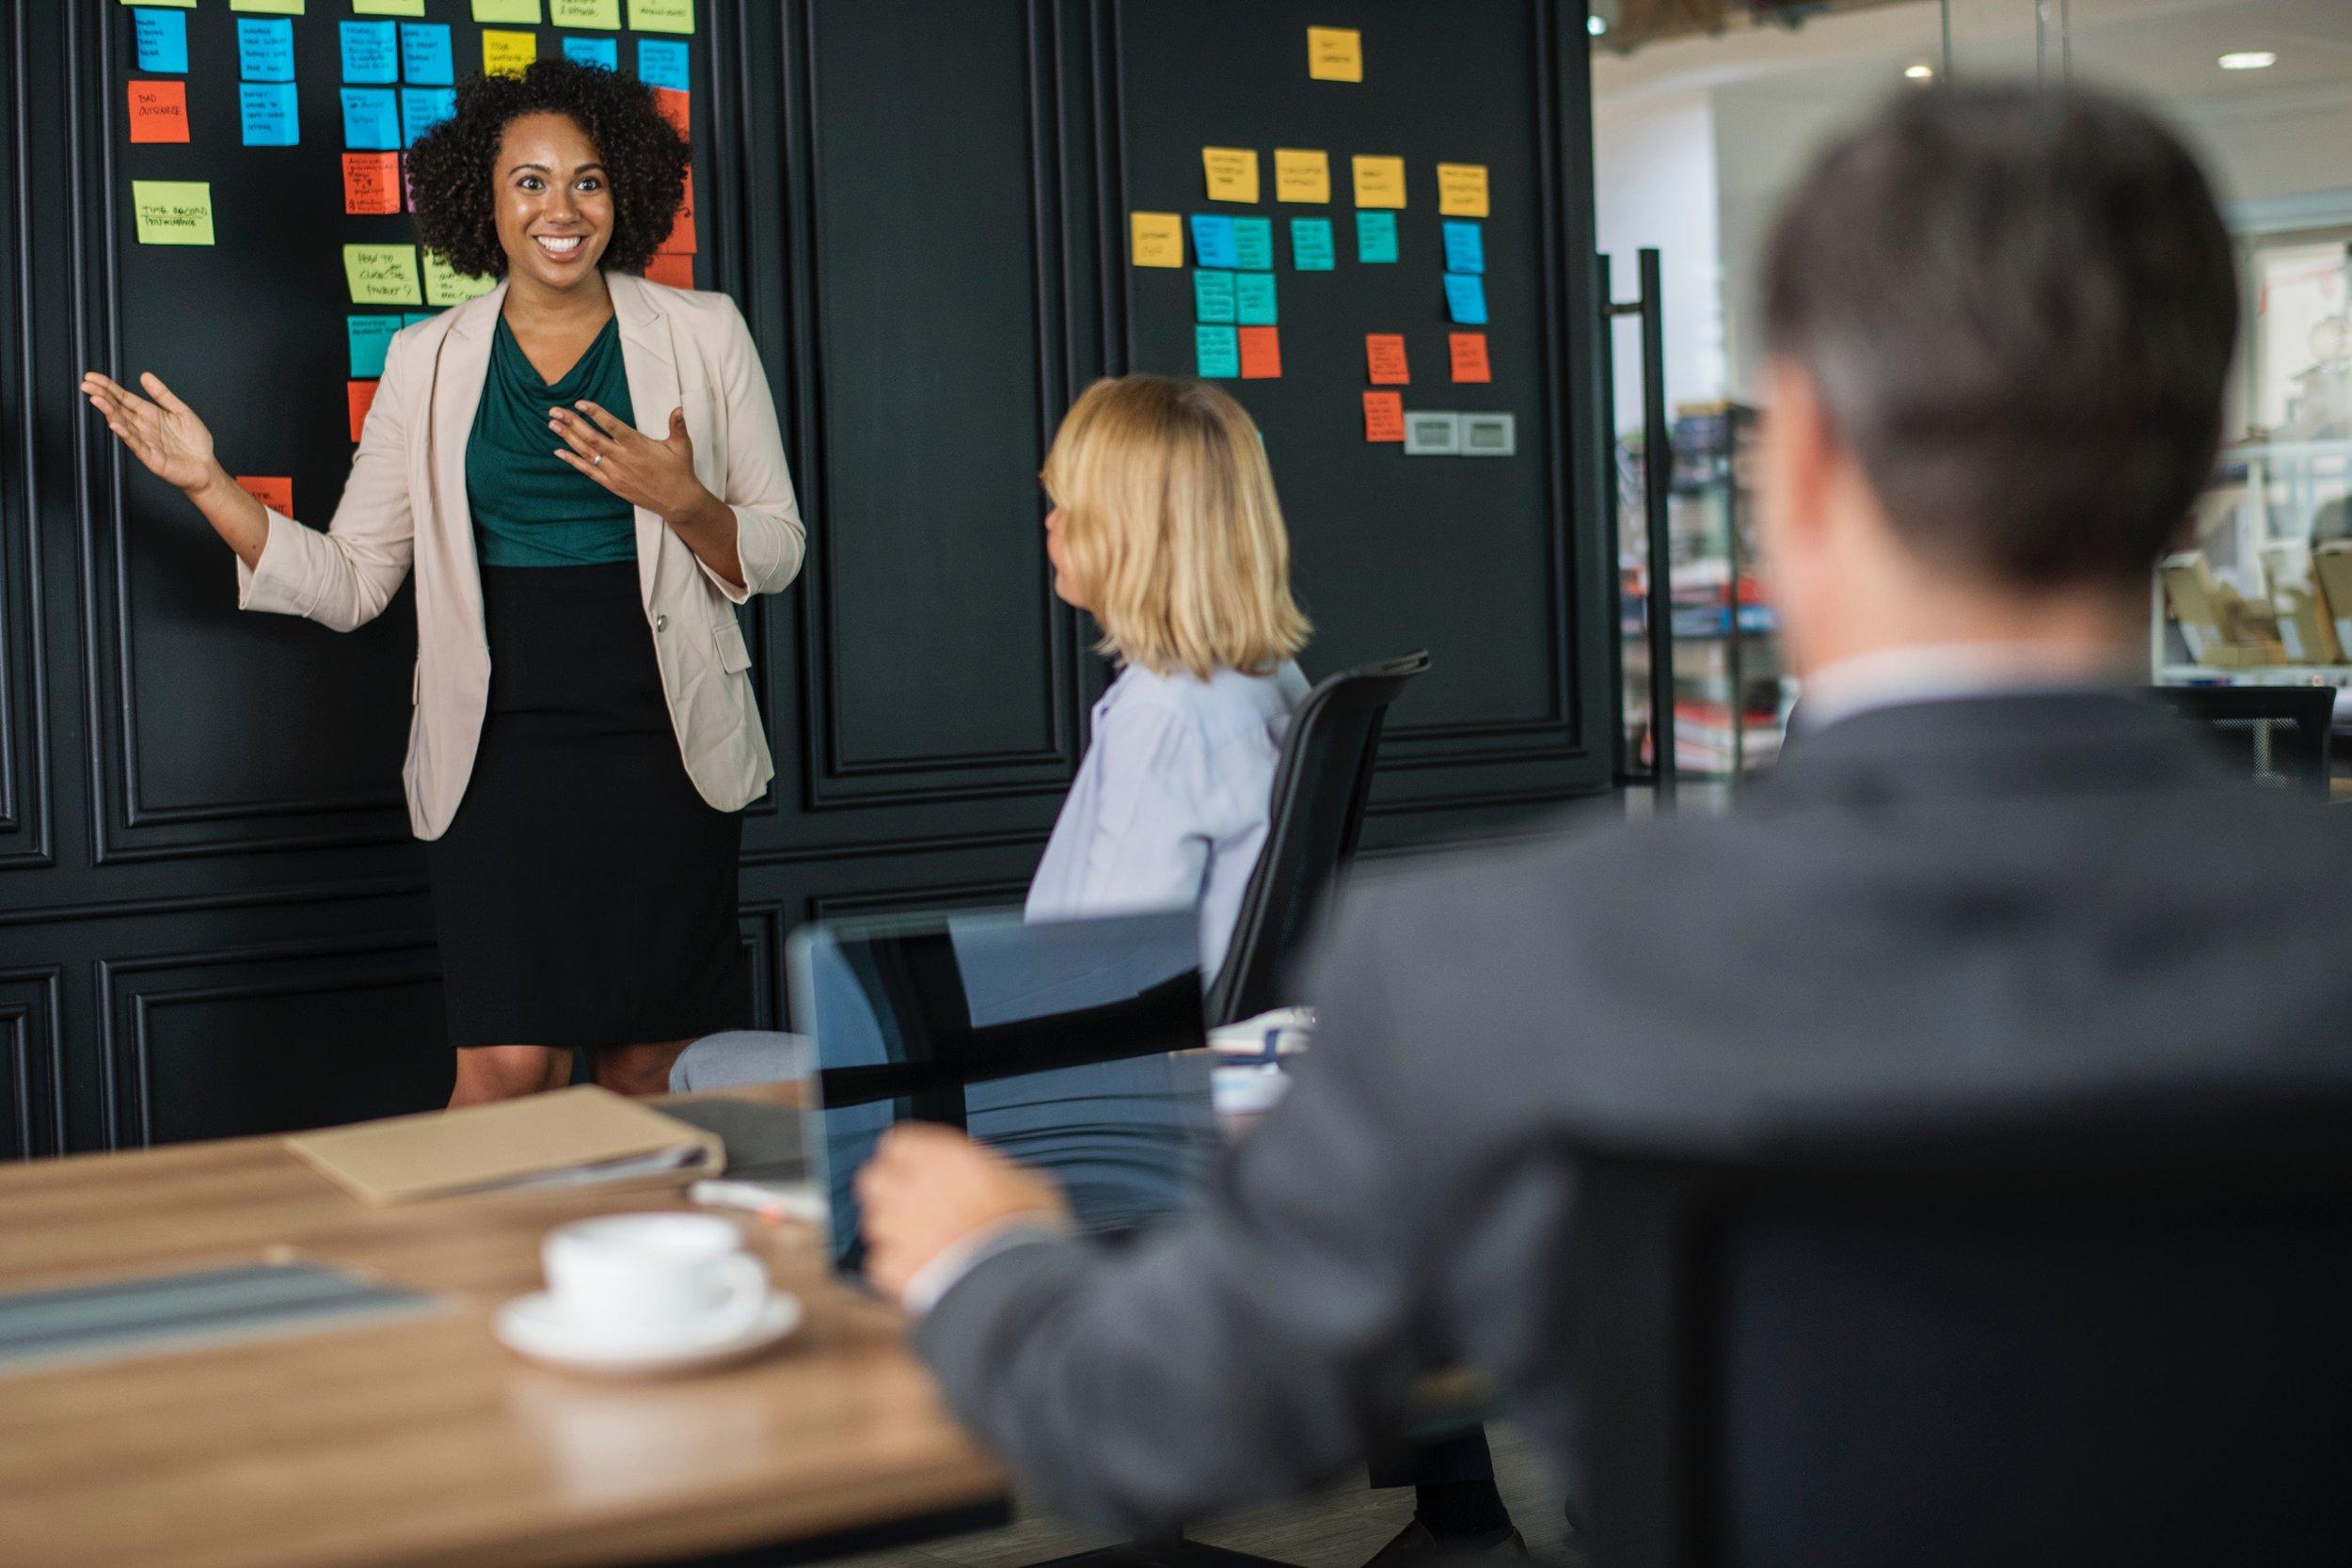 boss-brainstorming-business-1093913.jpg